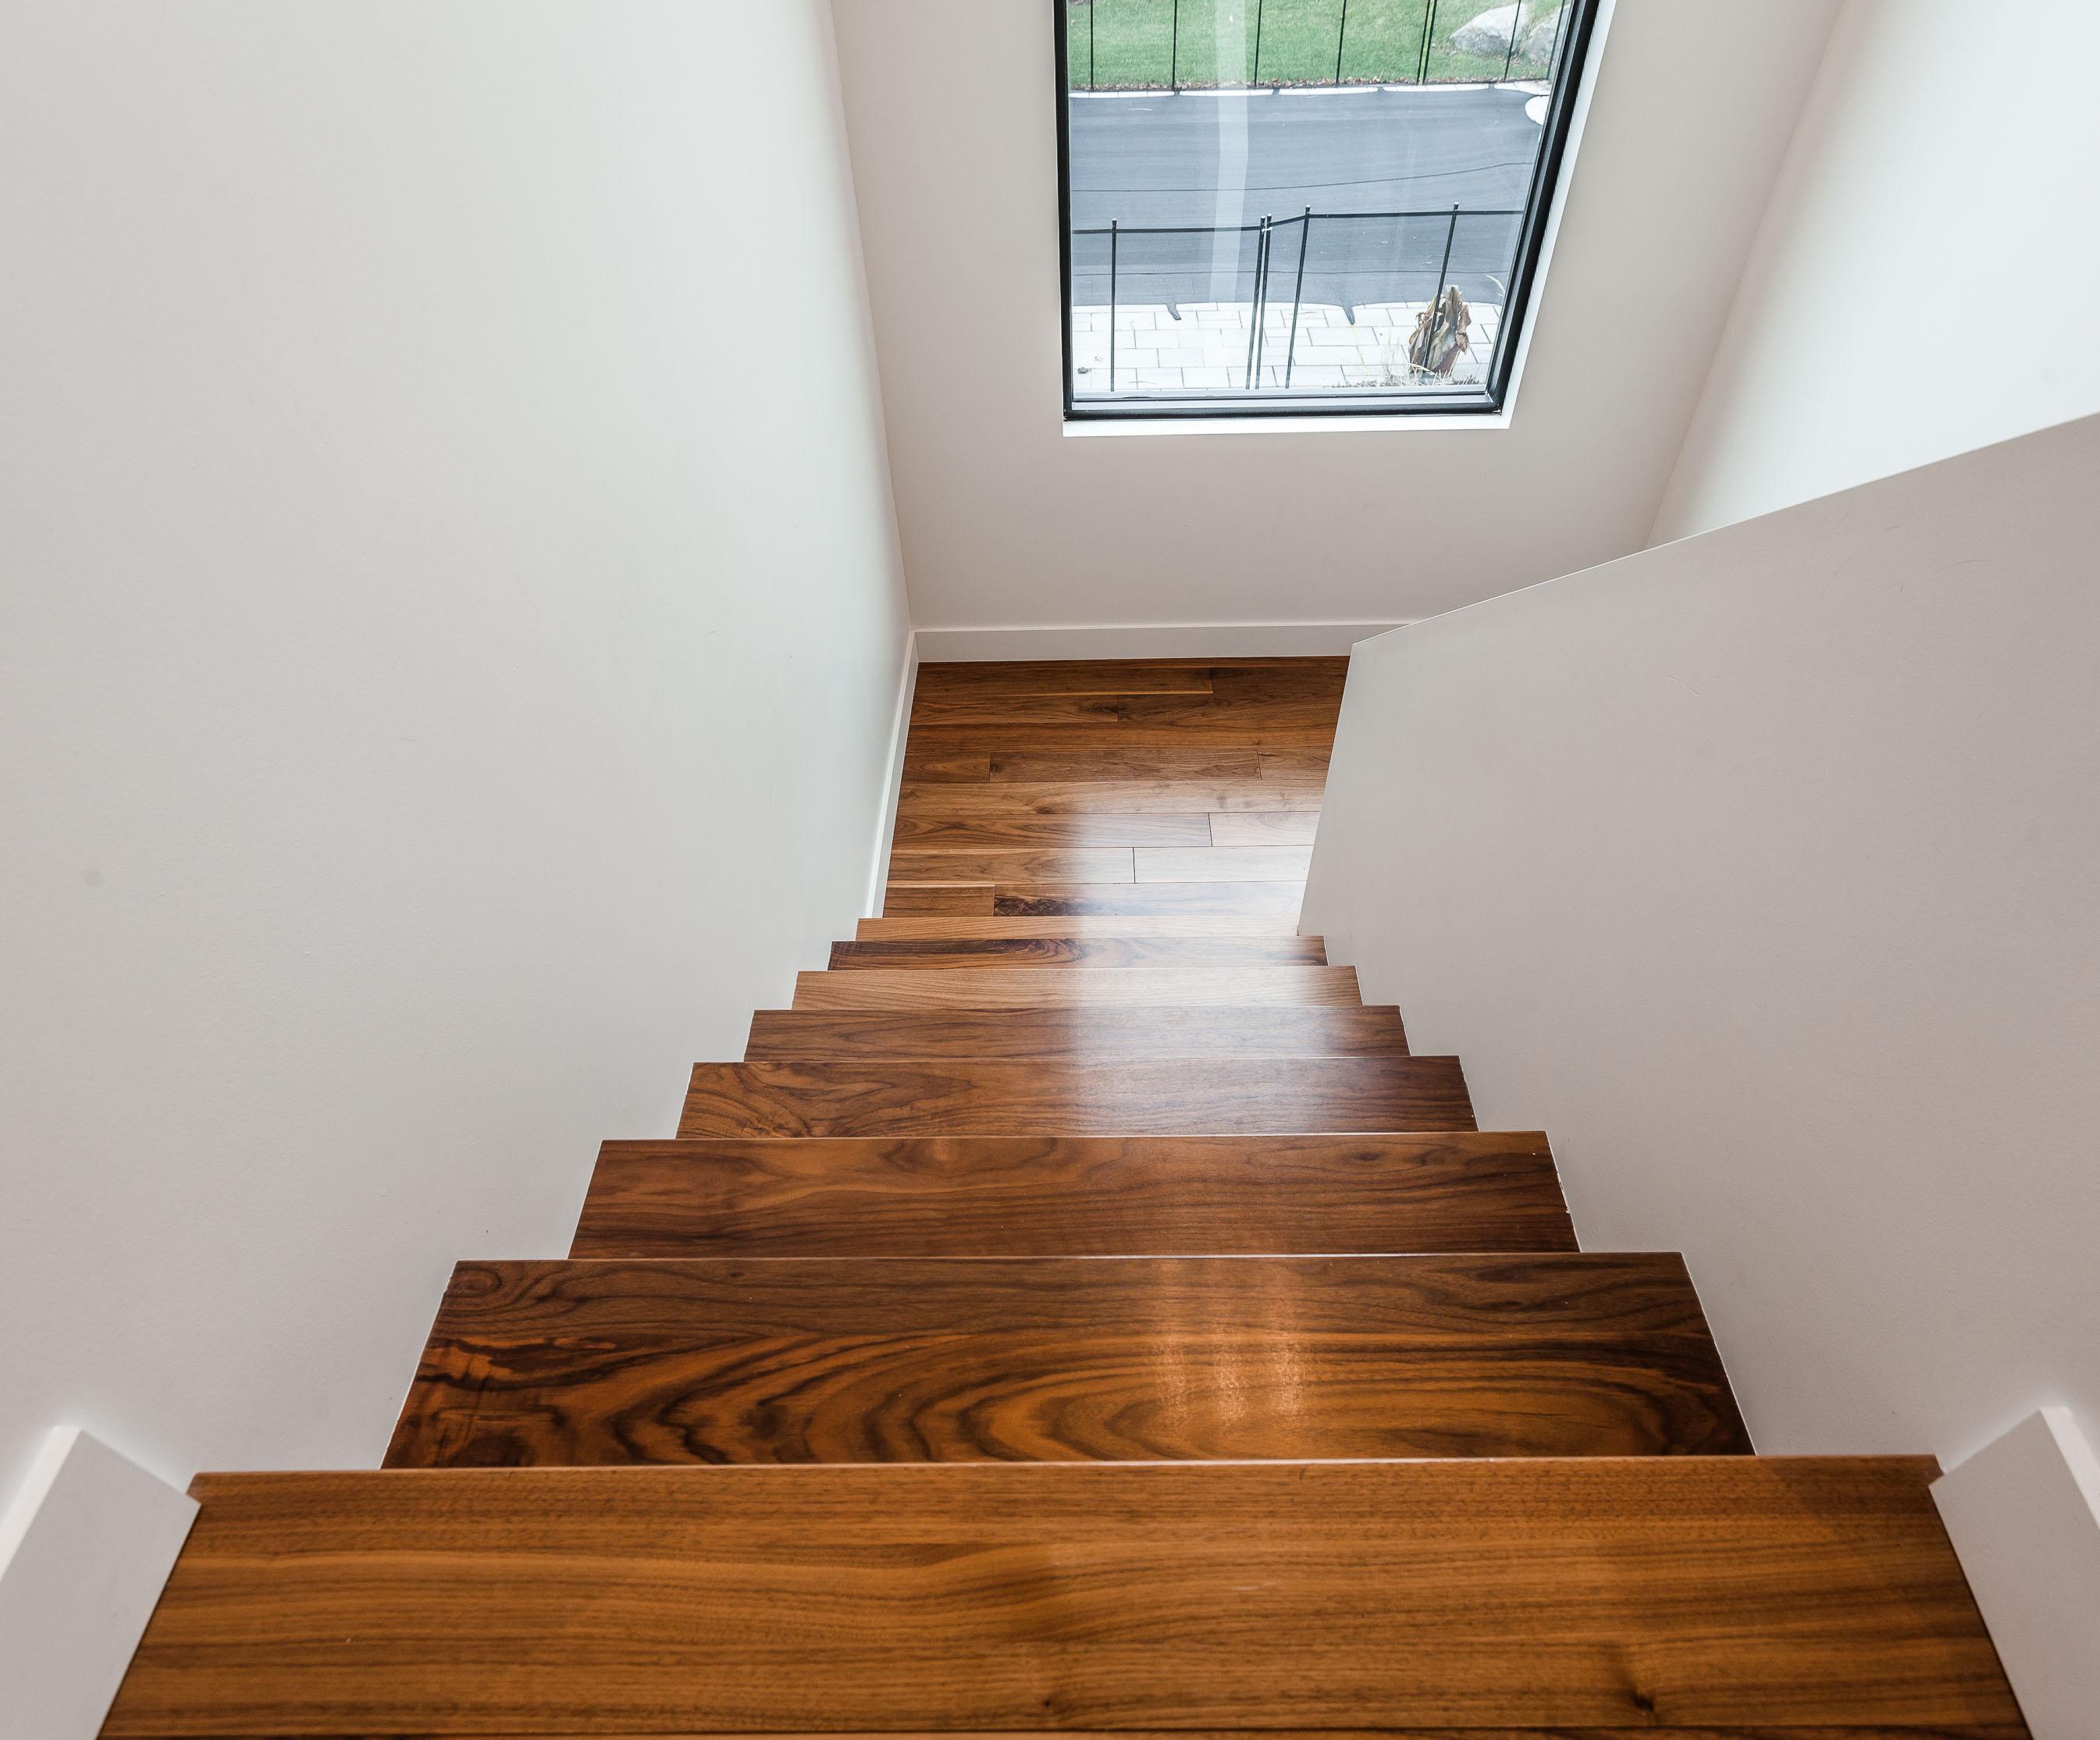 escalier noir escalier design escalier avec garde corps escalier interieur en mtal noir avec. Black Bedroom Furniture Sets. Home Design Ideas